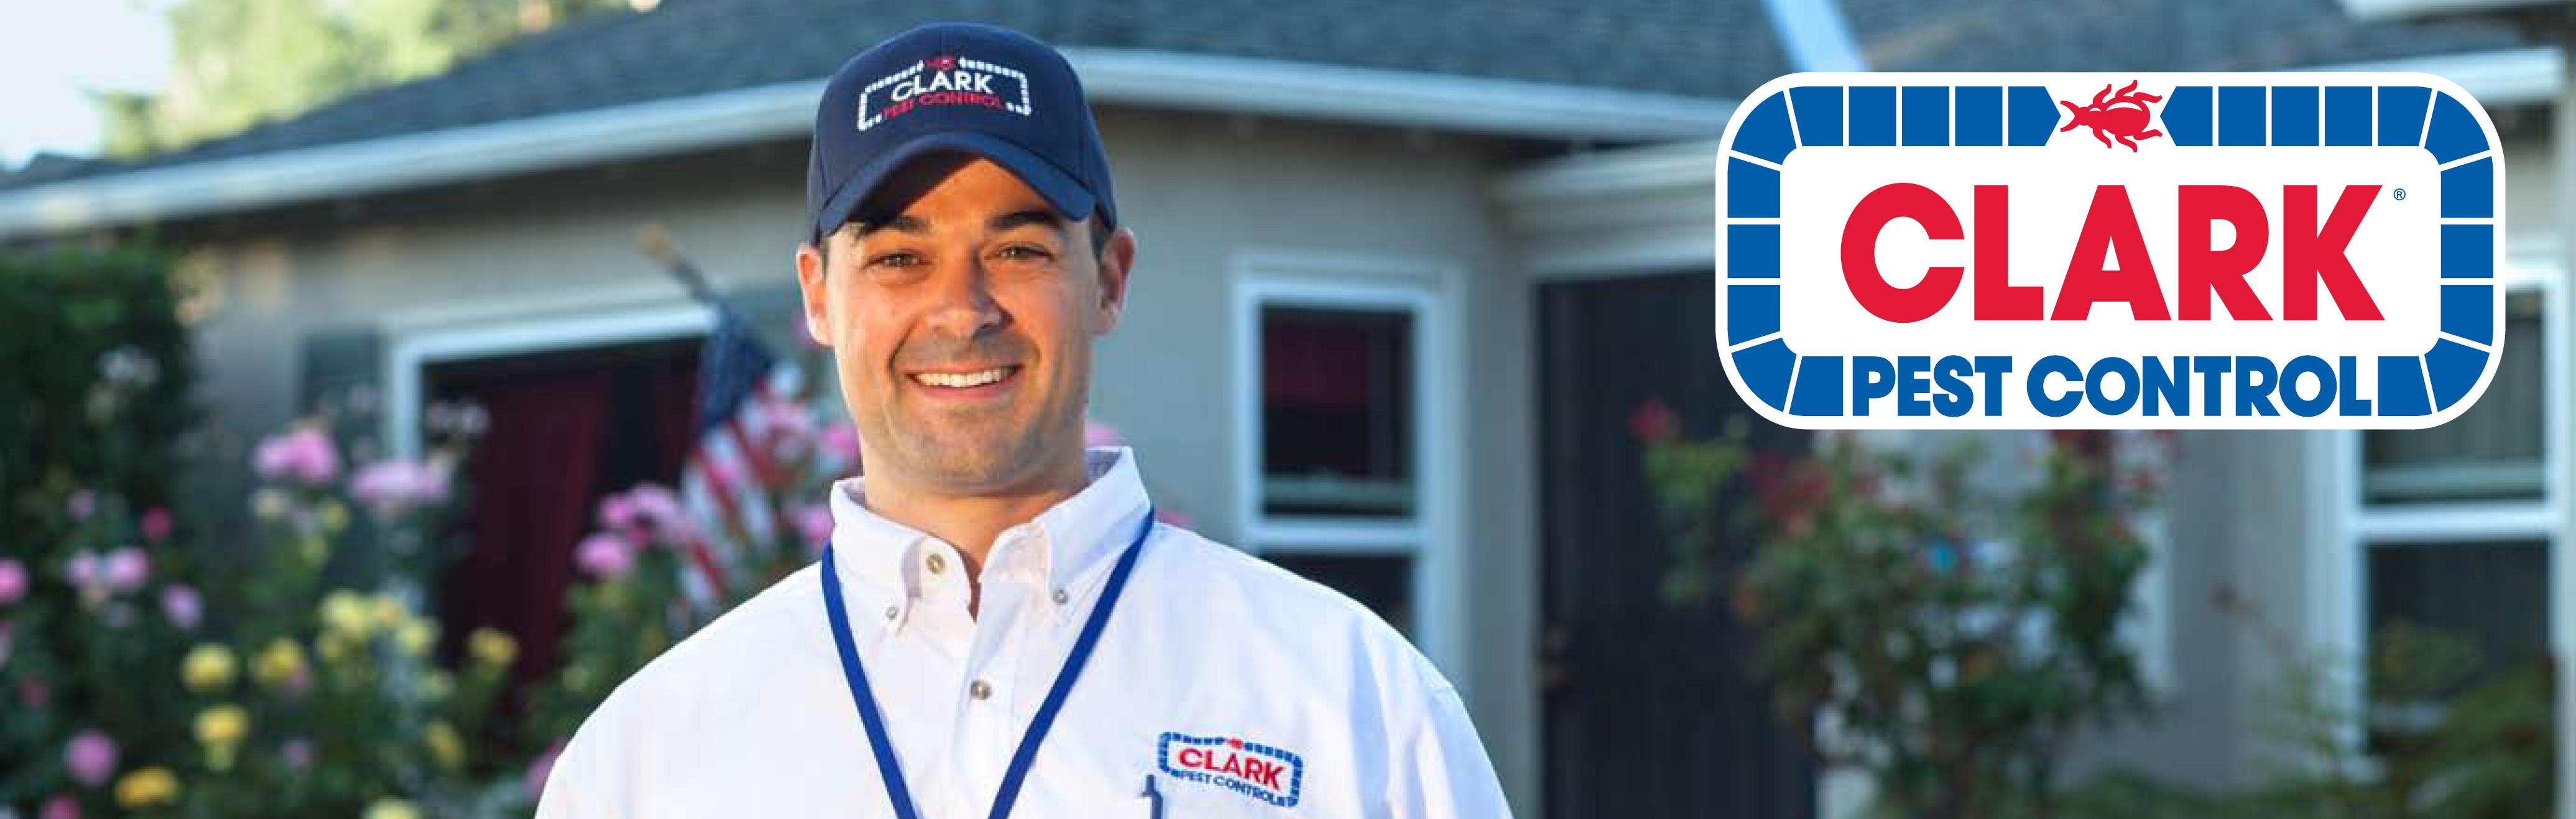 Clark Pest Control reviews | Pest Control at 3403 Durahart St - Riverside CA